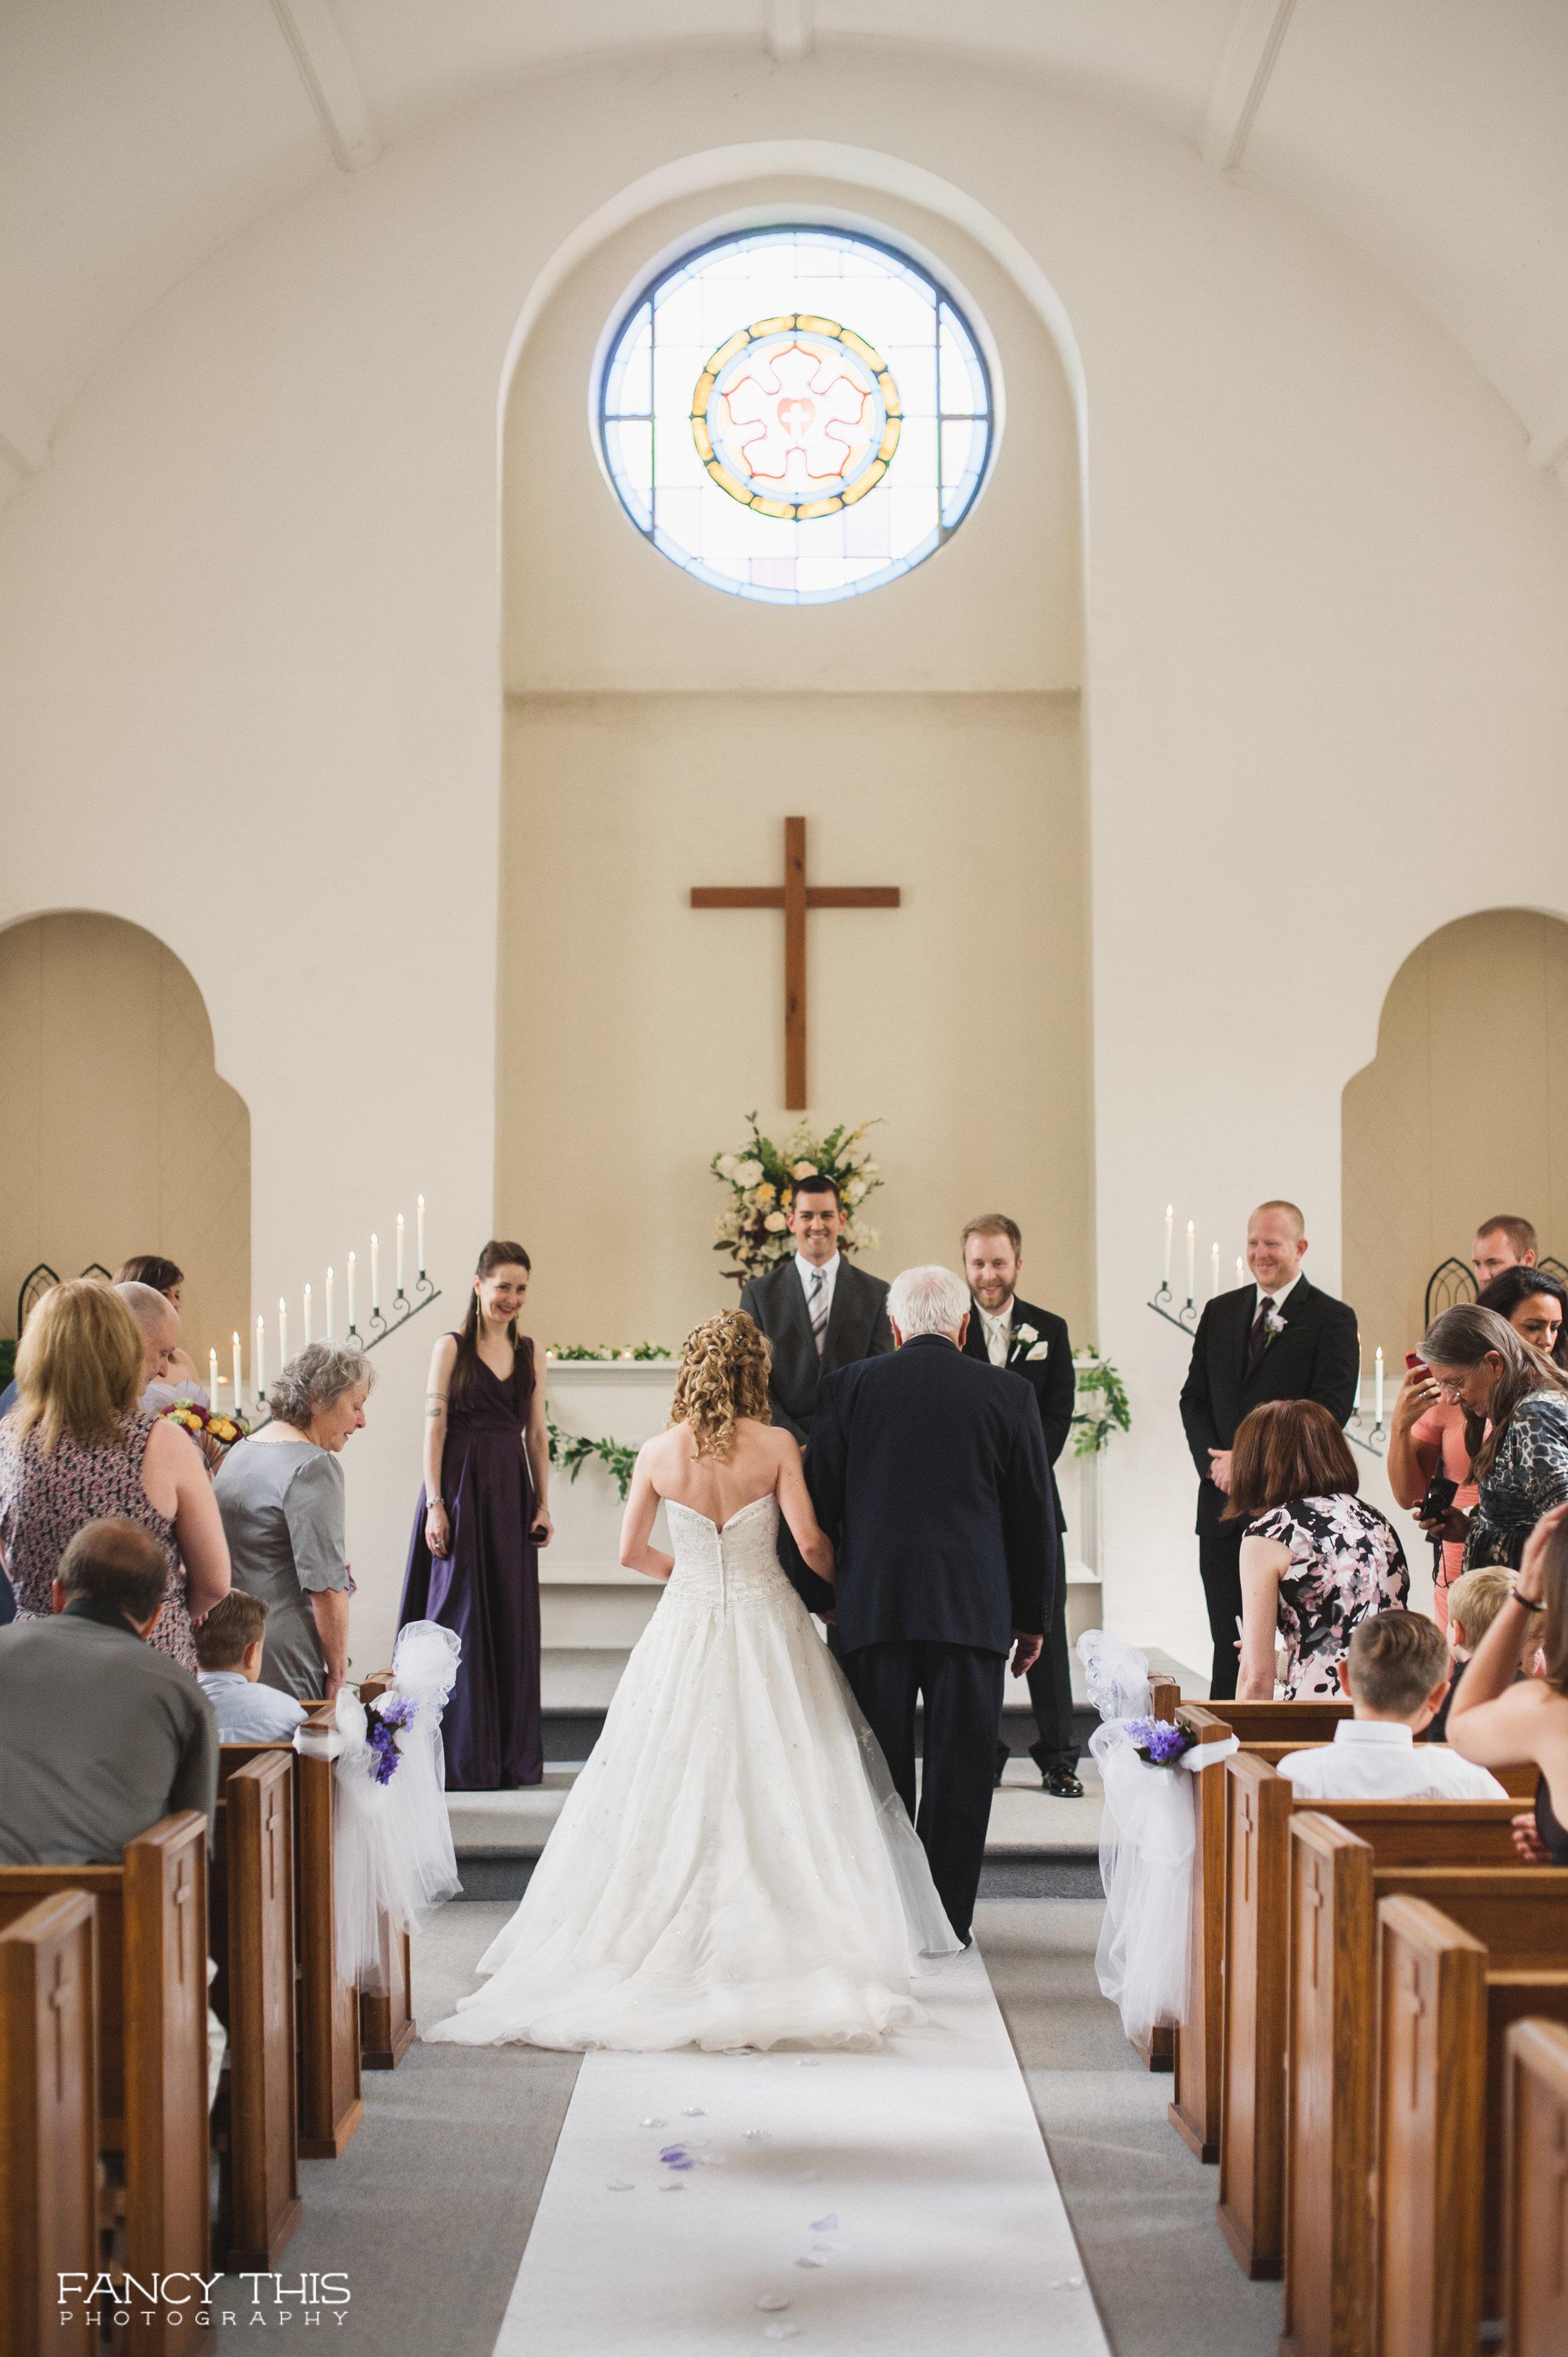 courtneyjasonwedding_socialmediaready093.jpg